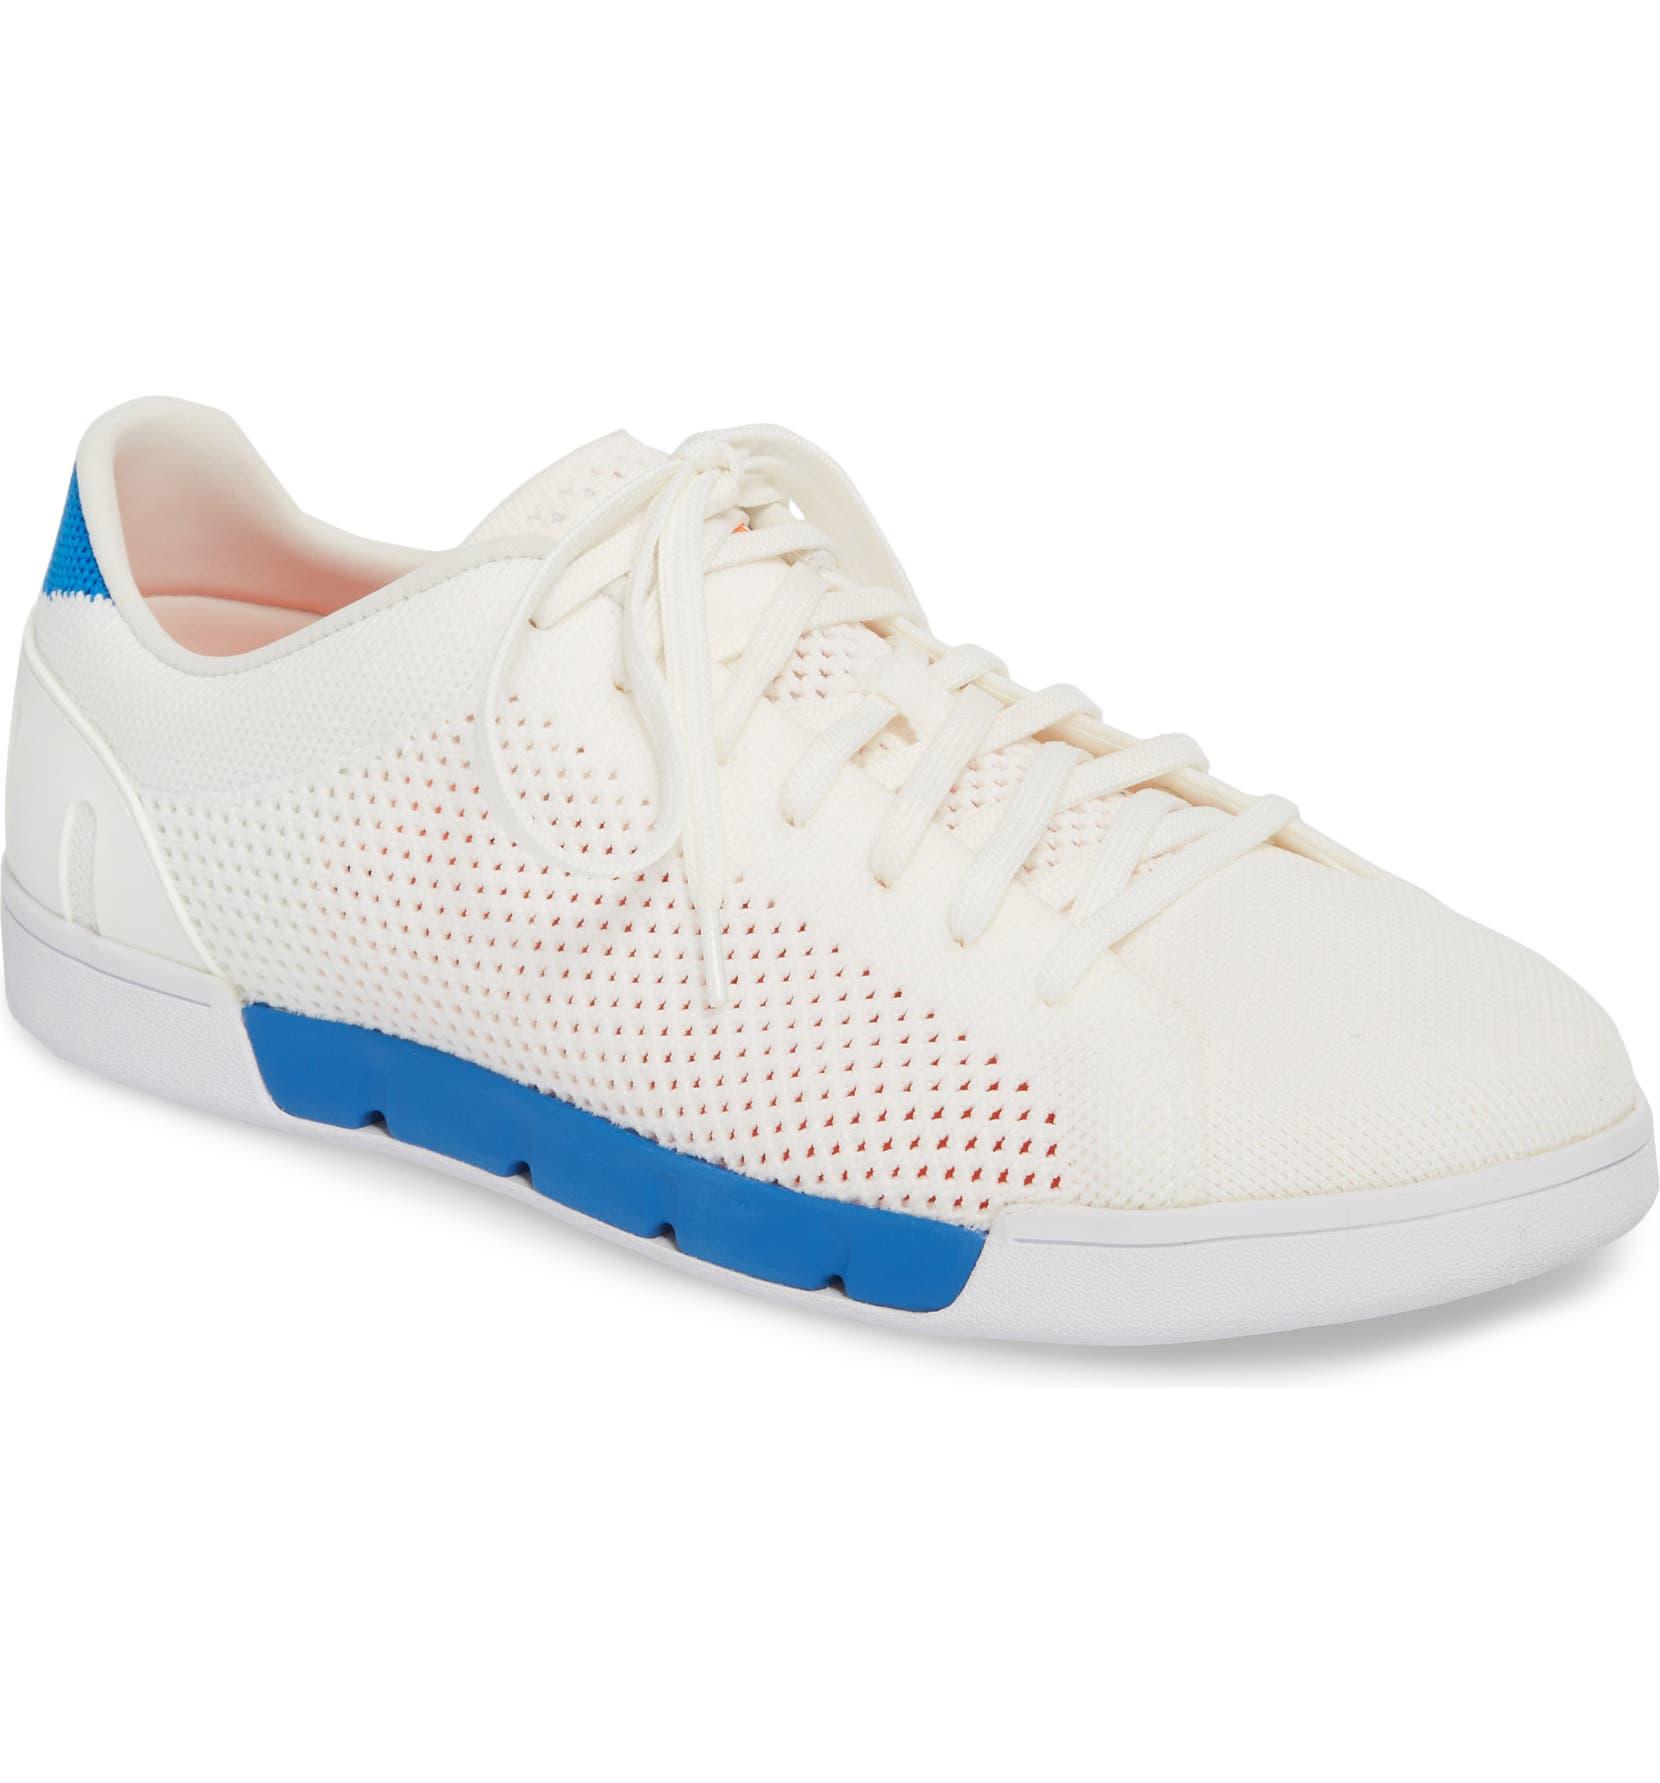 01010b20307c Swims Breeze Tennis Washable Knit Sneaker (Men)